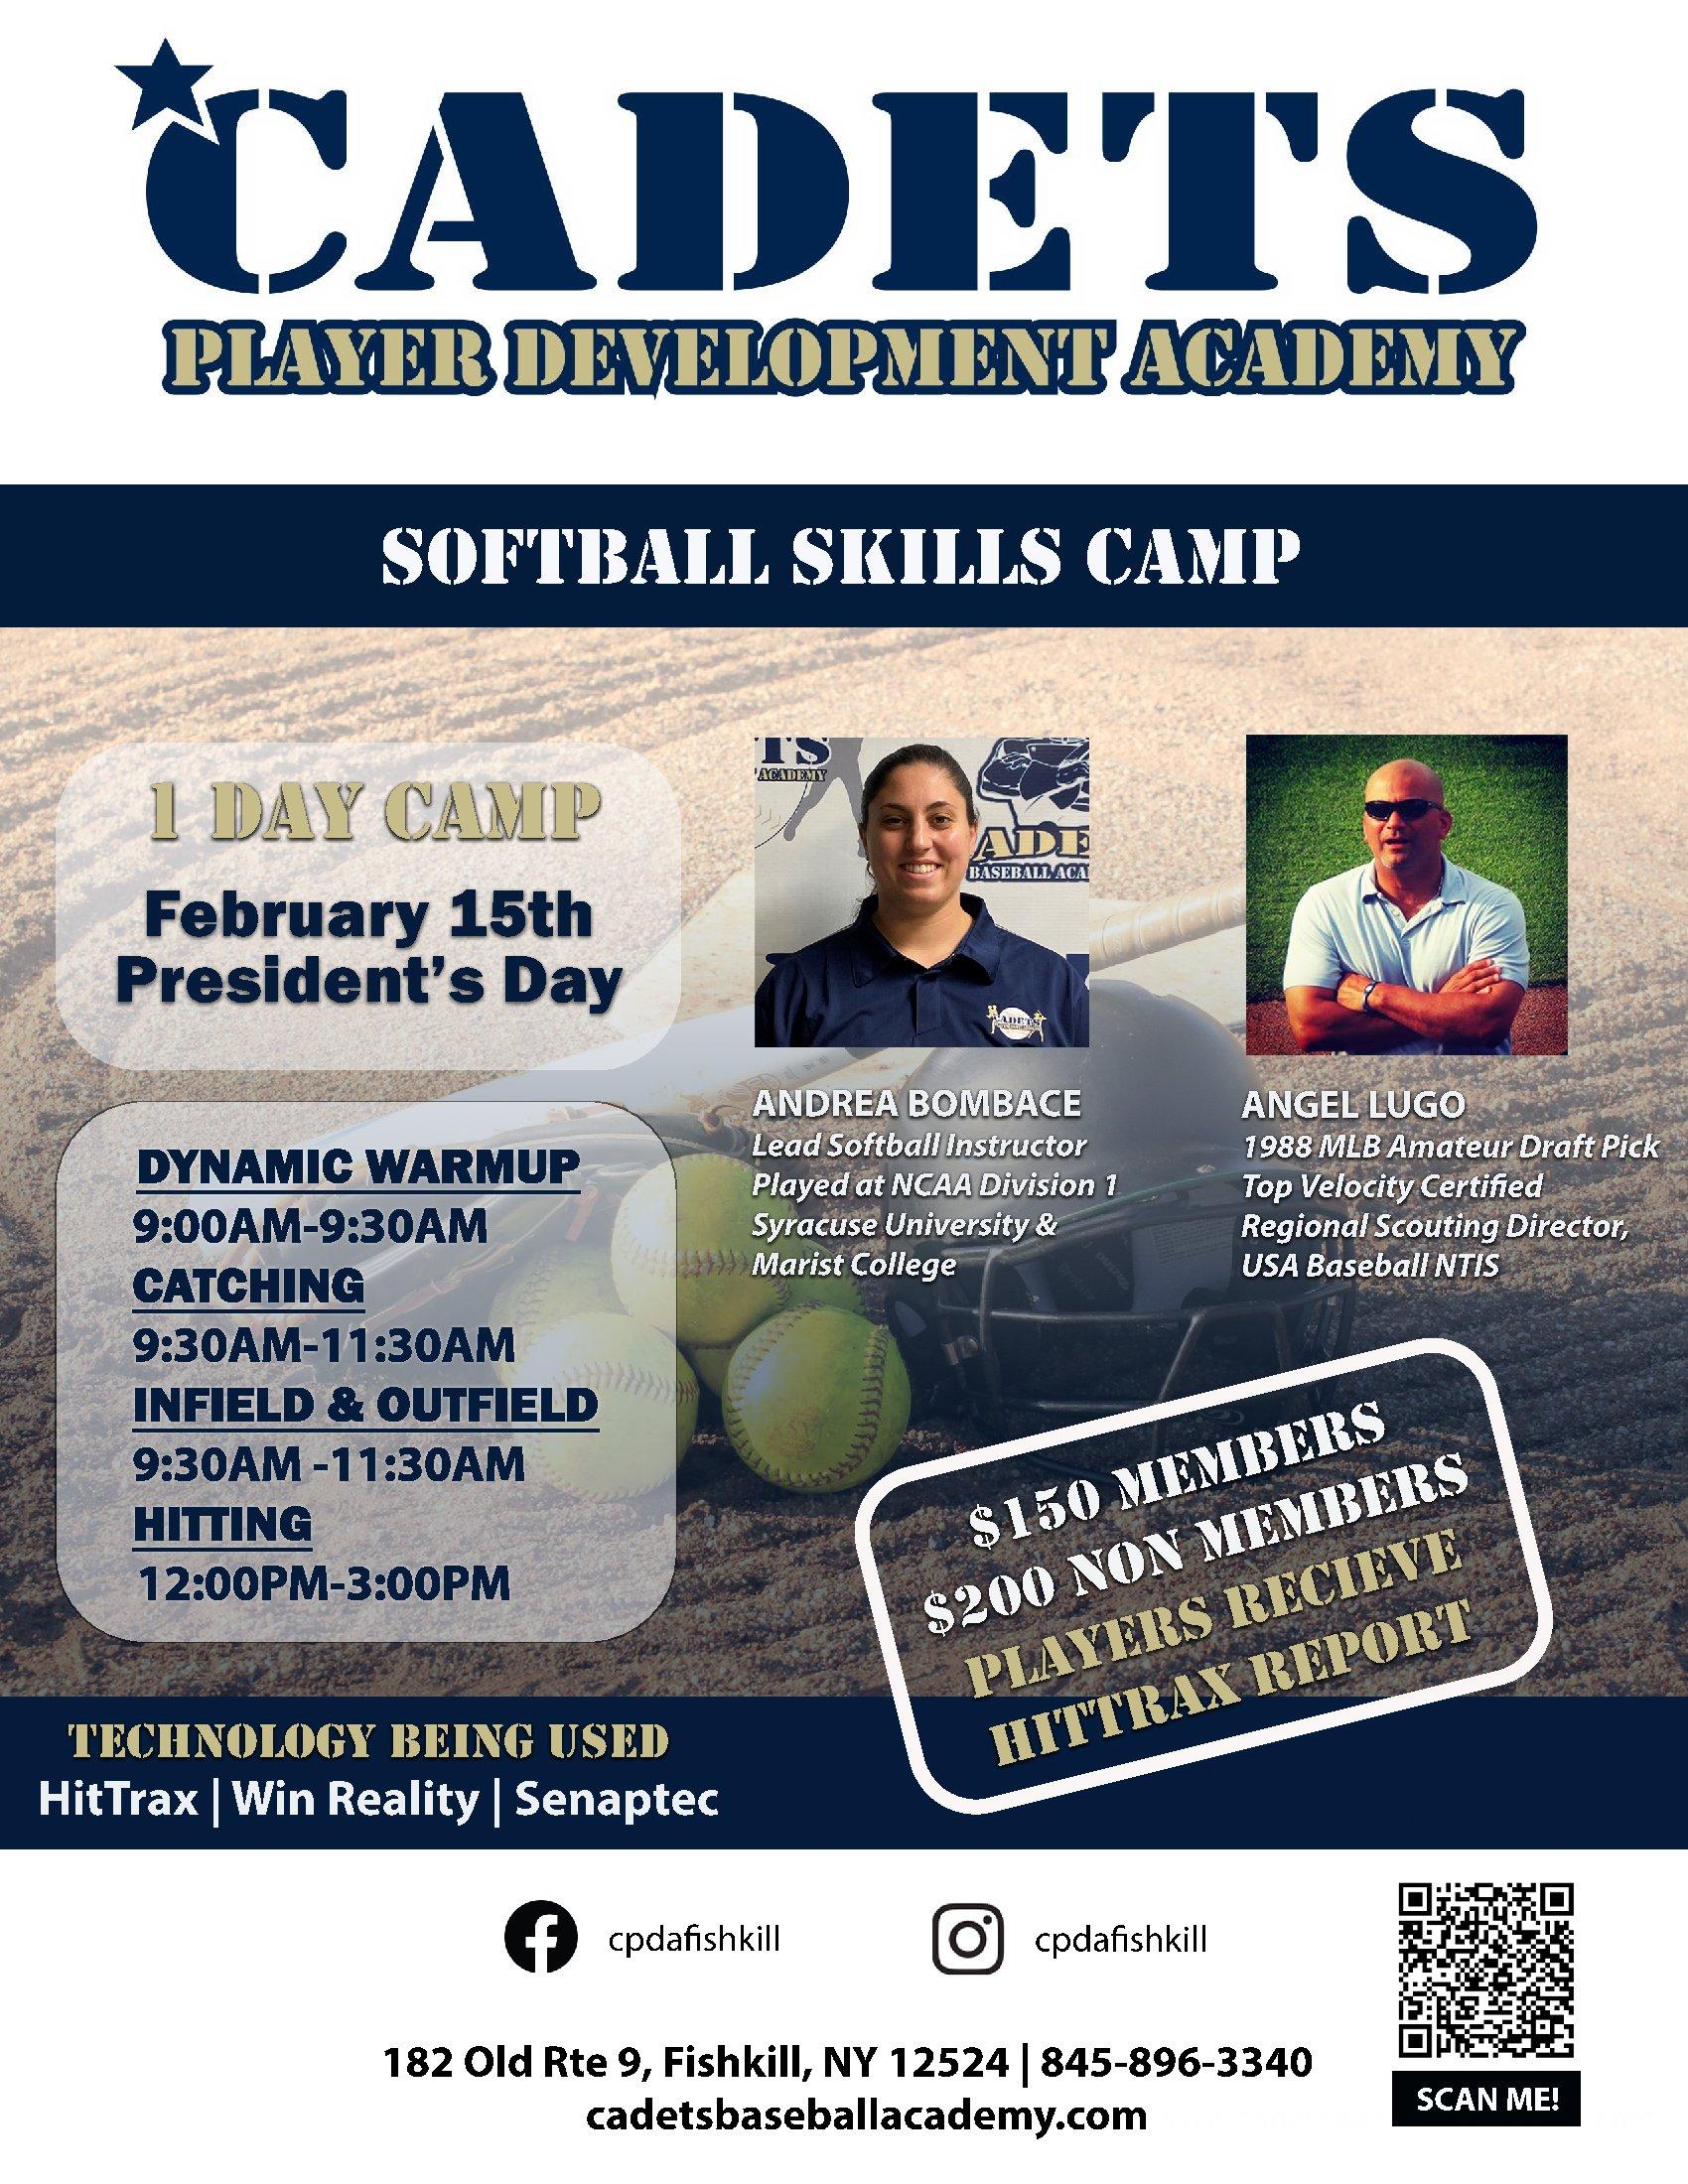 CPDA Presidents Day softball skills camp